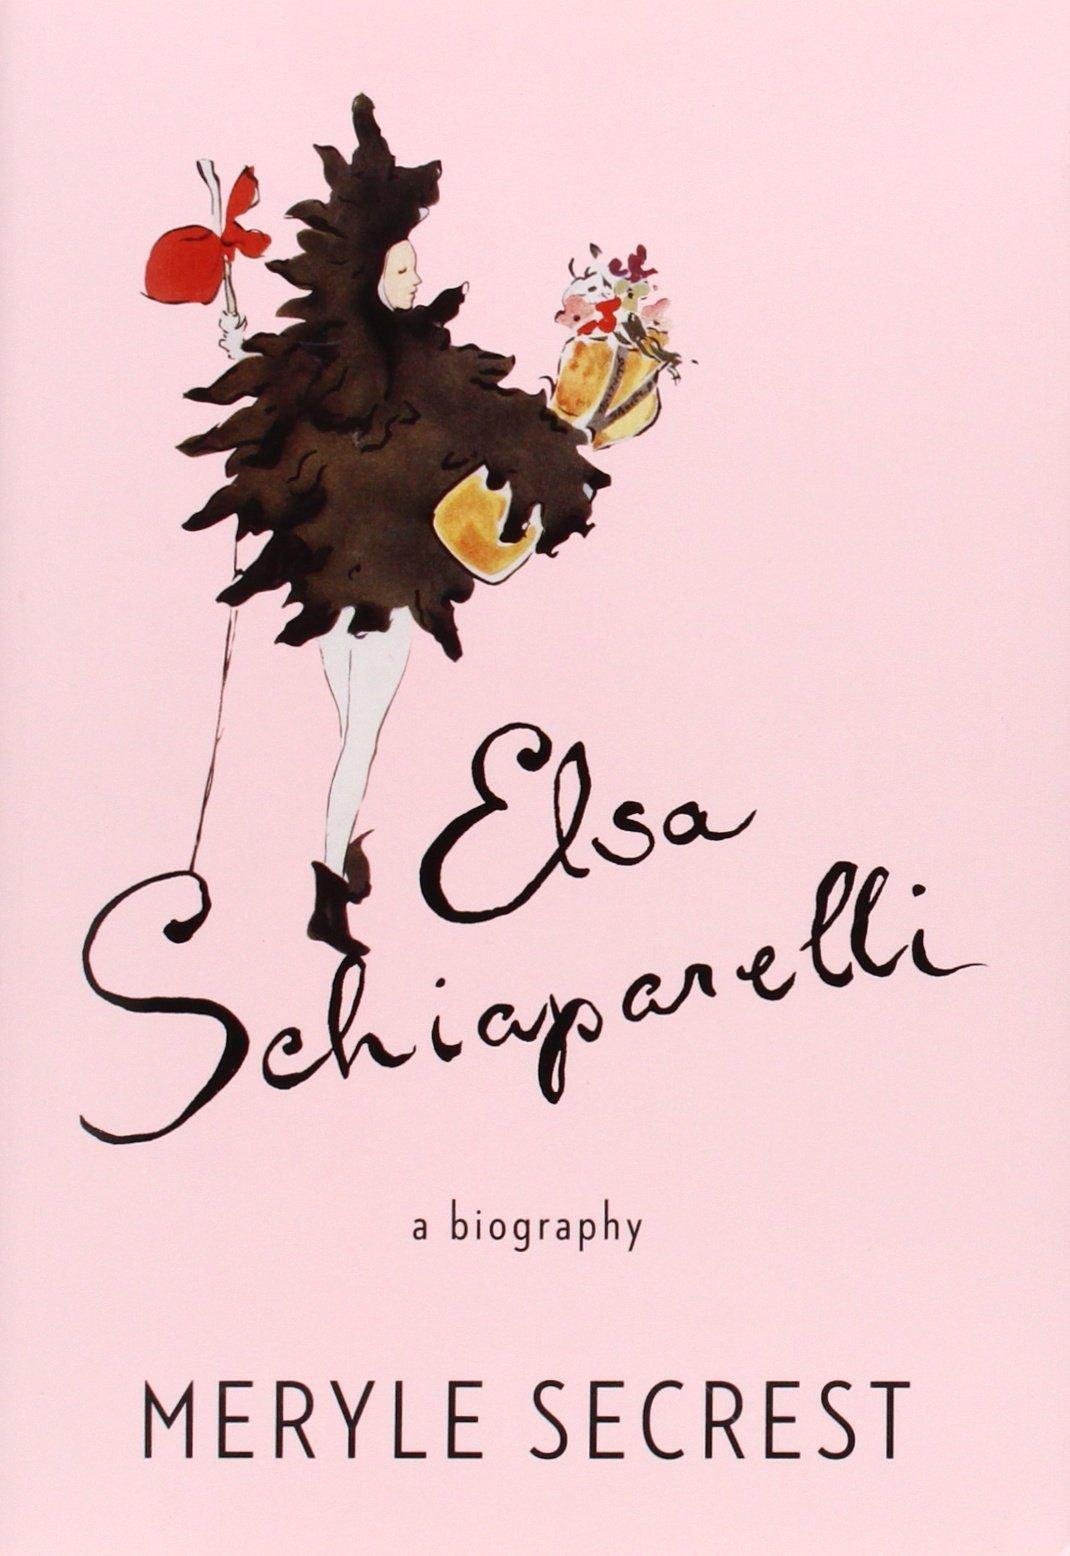 Innovator Elsa Schiaparelli profiled in new biography